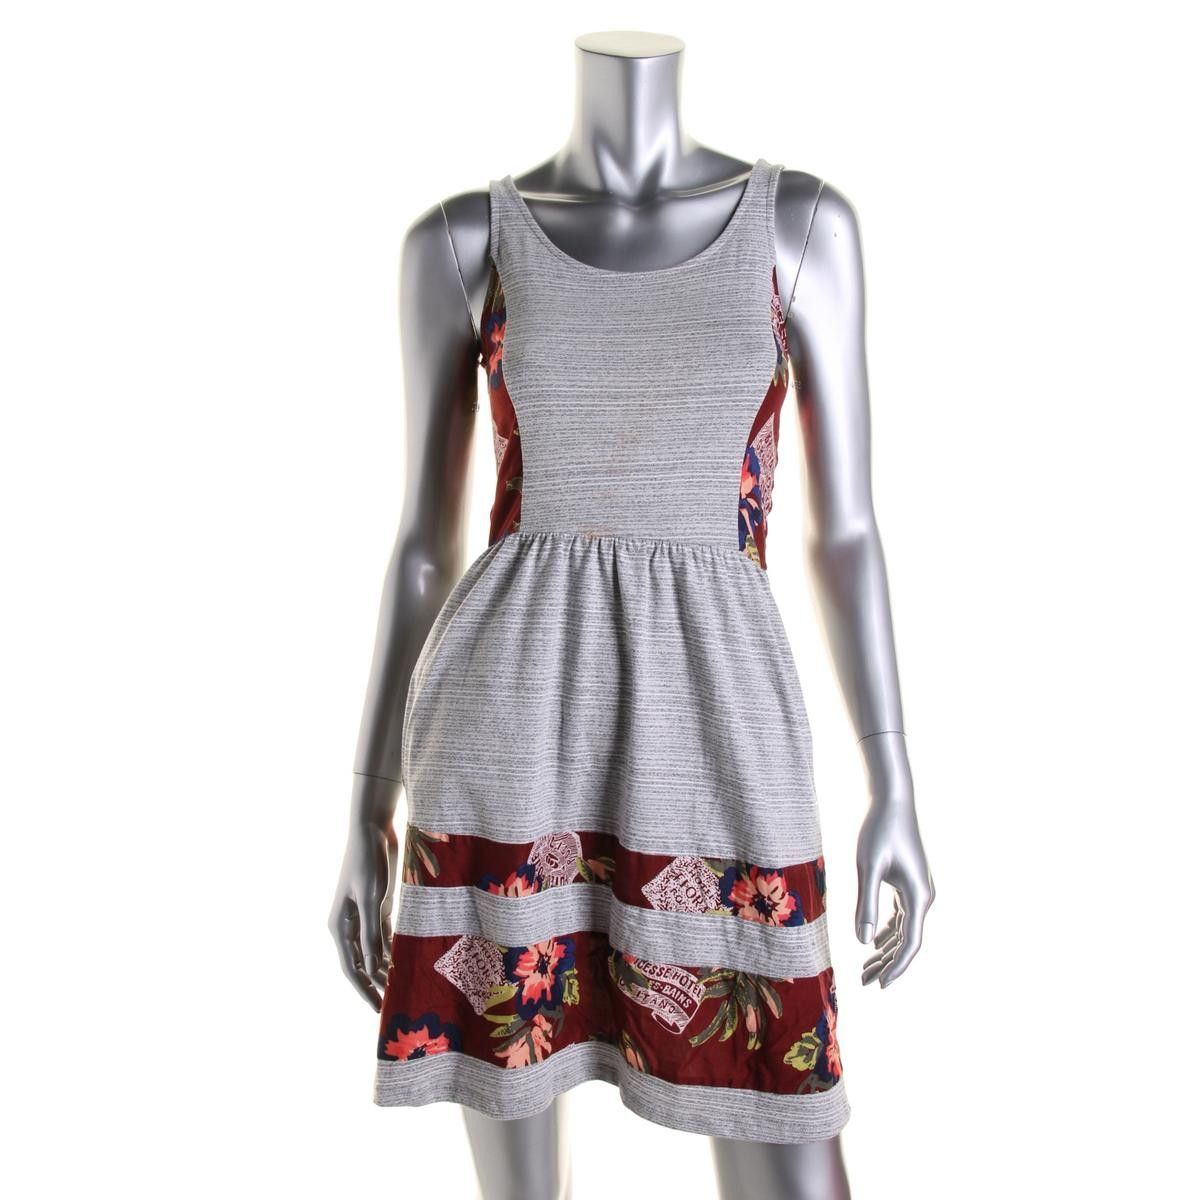 Maison Jules Womens Colorblock Sleeveless Casual Dress